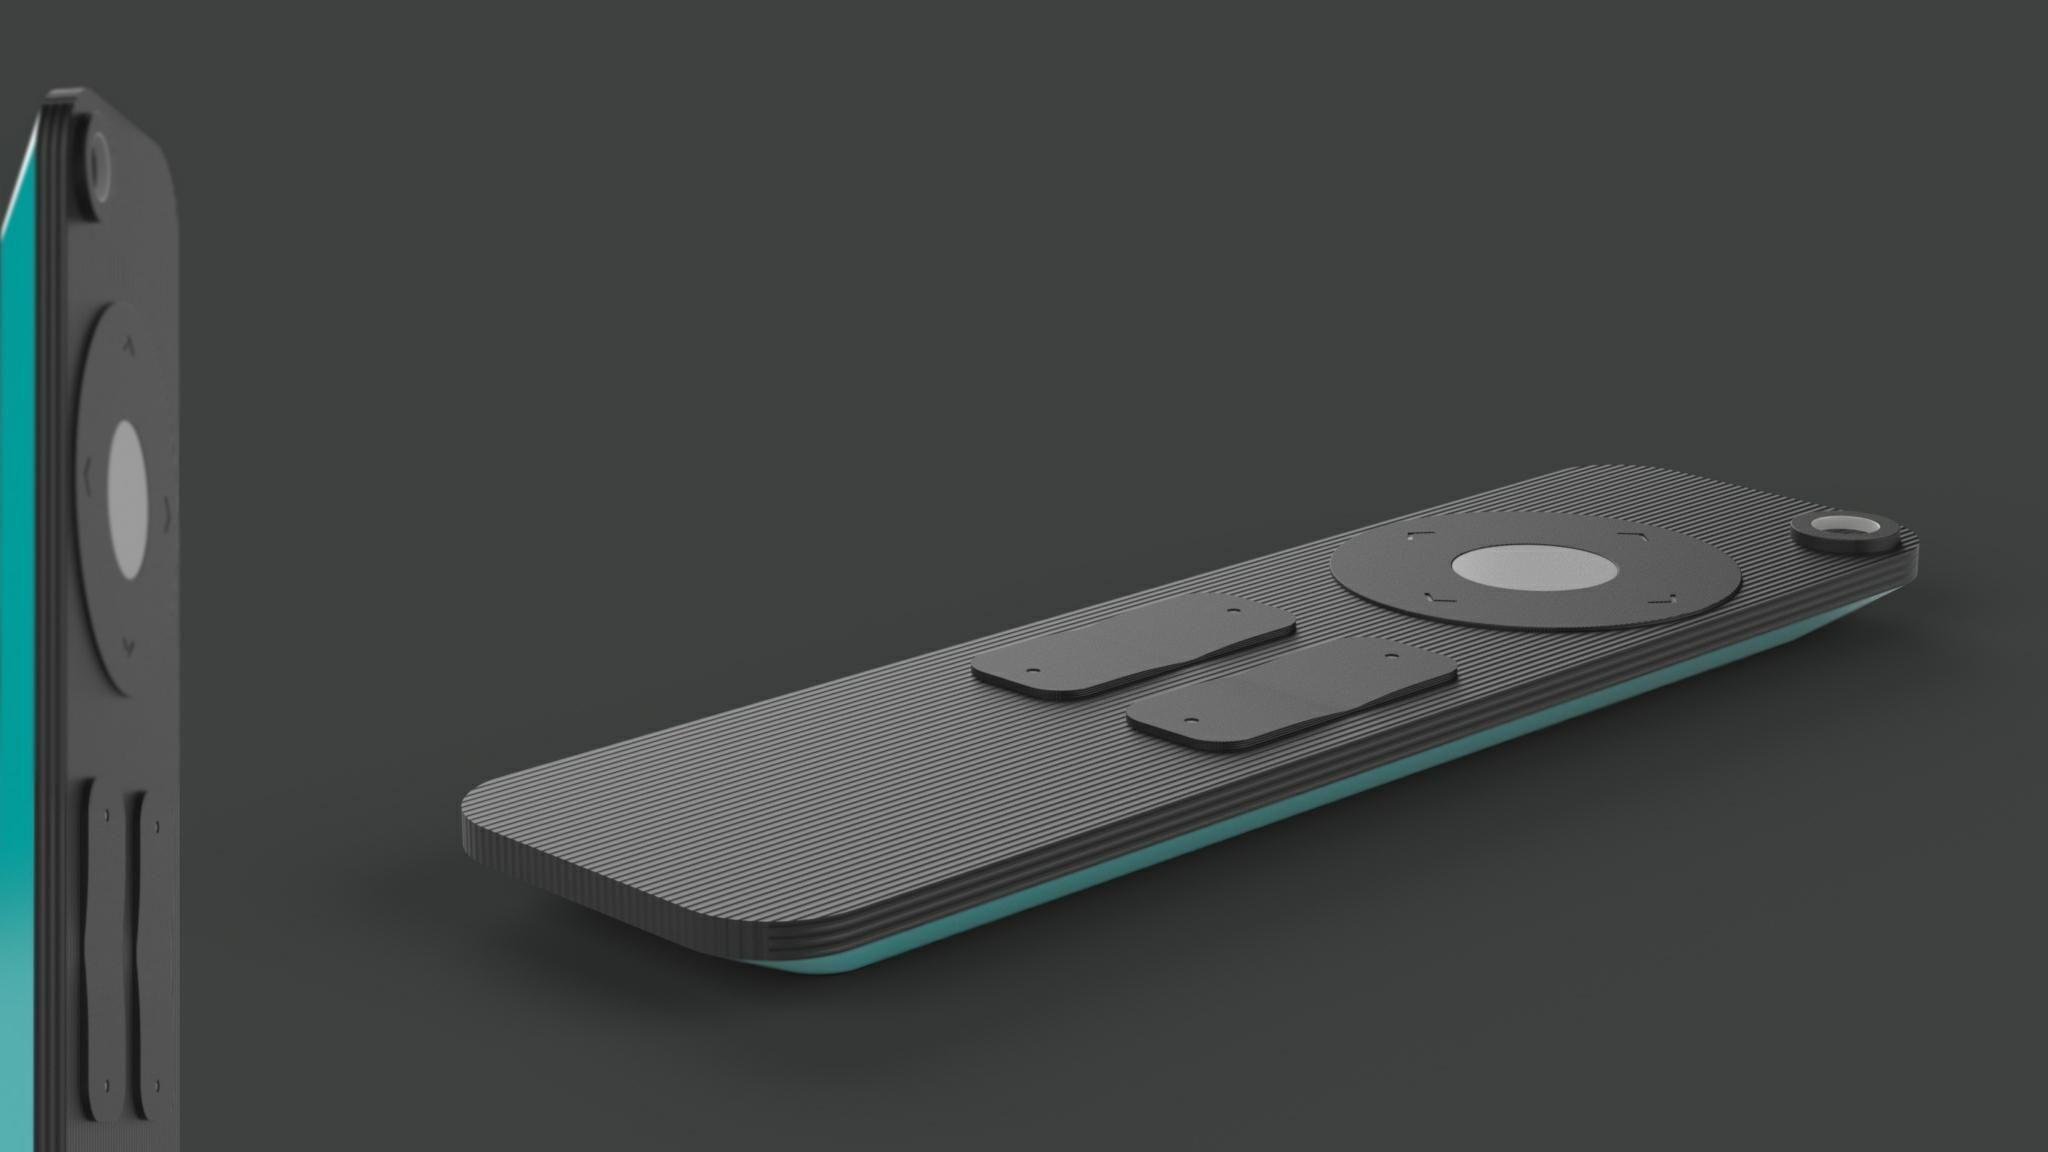 Design-ctr---fablcs2018-3500-3500